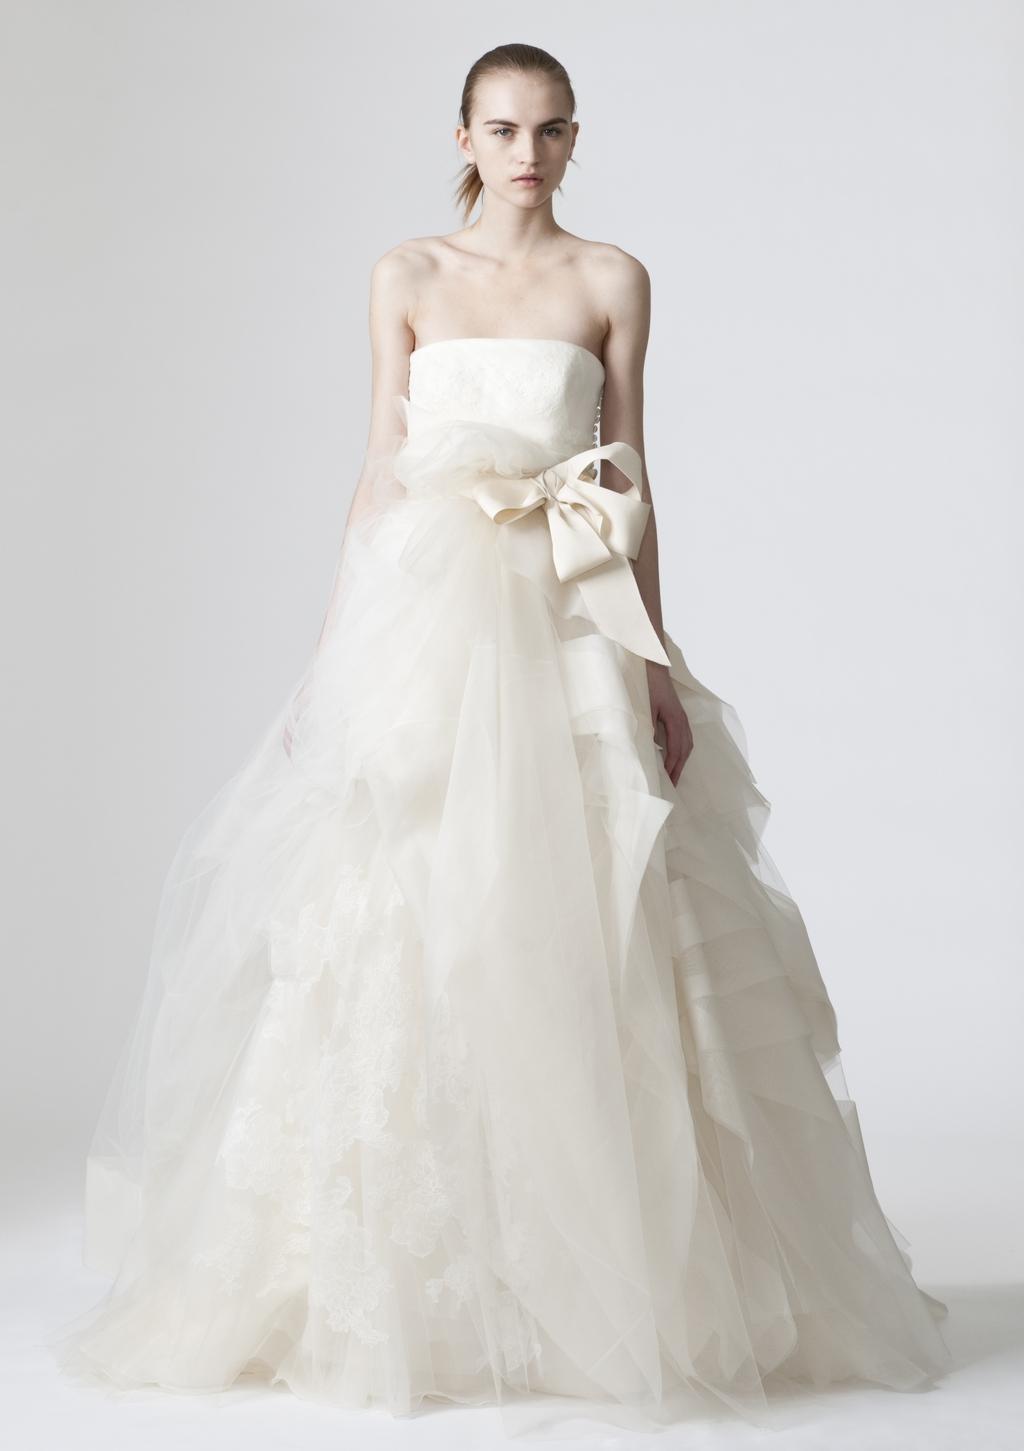 Vera-wang-wedding-dresses-spring-2010-16.full